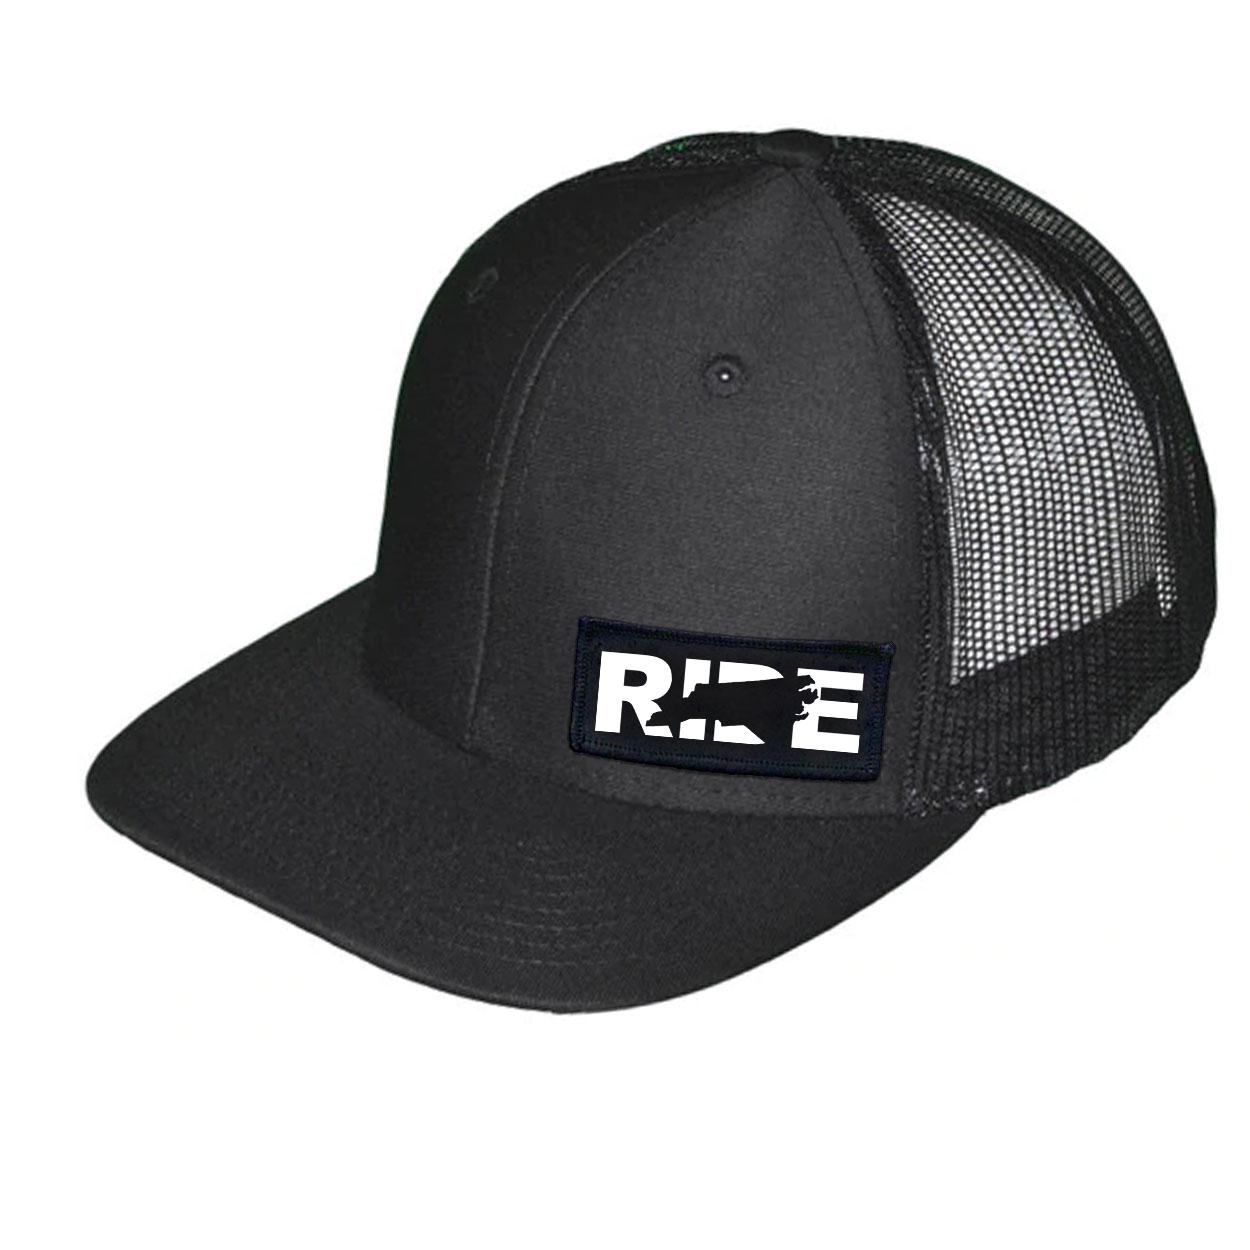 Ride North Carolina Night Out Woven Patch Snapback Trucker Hat Black (White Logo)